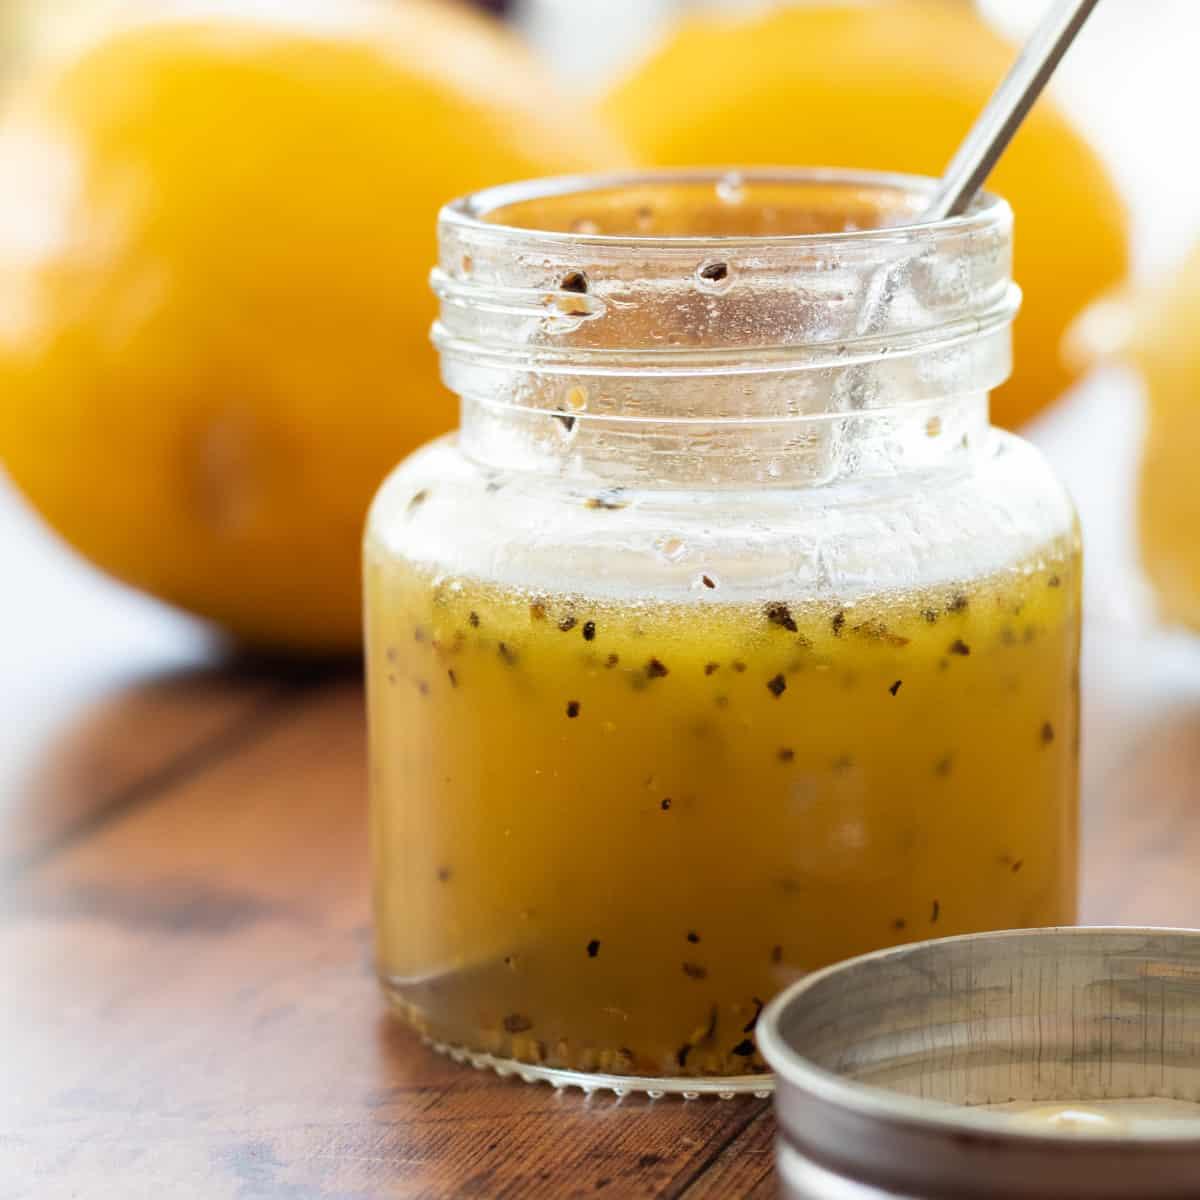 honey lemon vinaigrette in a jar with a spoon